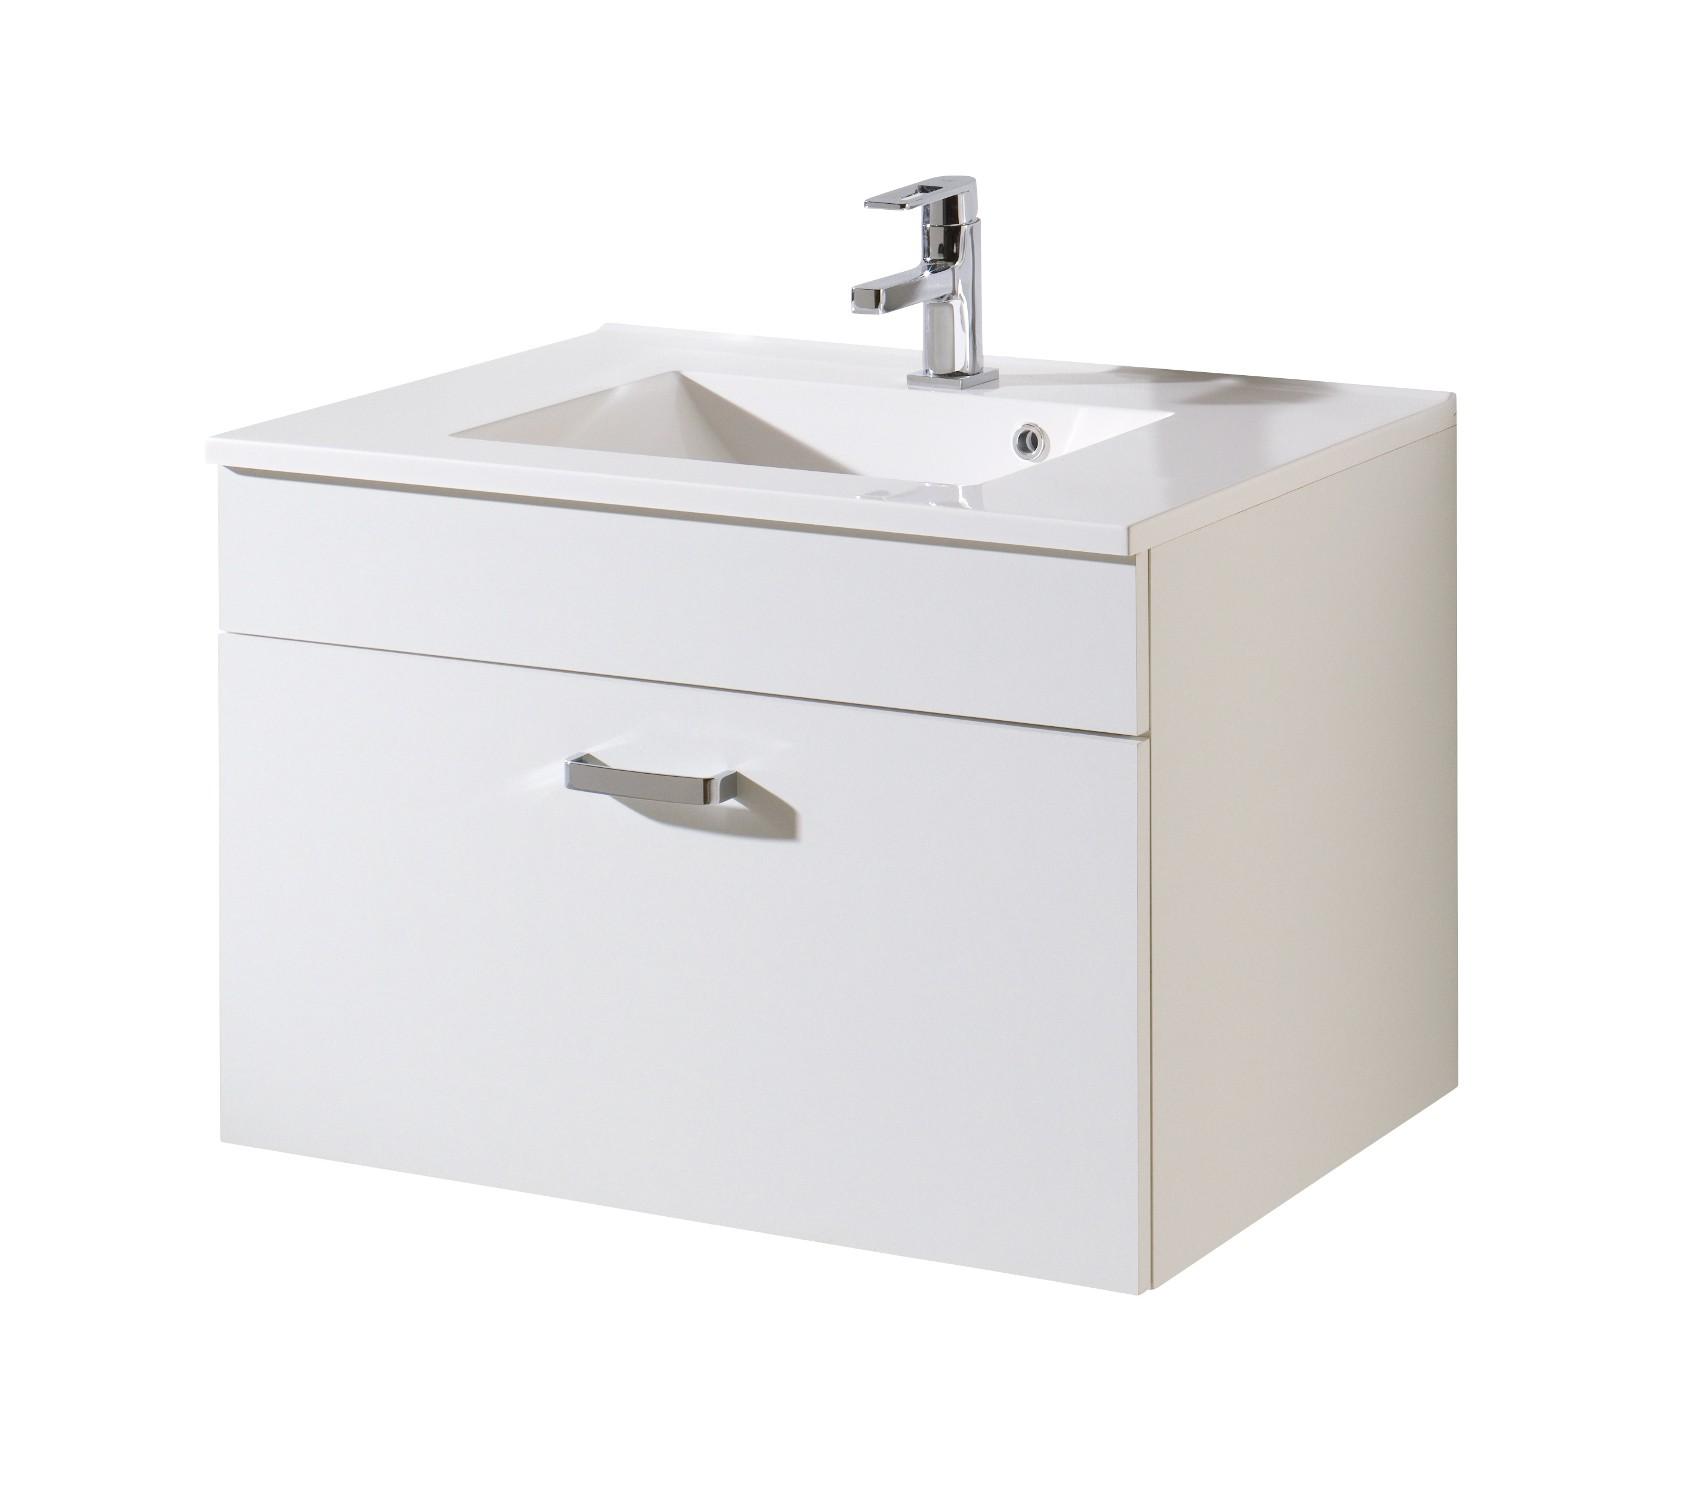 bad waschtisch capri 1 auszug 80 cm breit wei bad capri. Black Bedroom Furniture Sets. Home Design Ideas